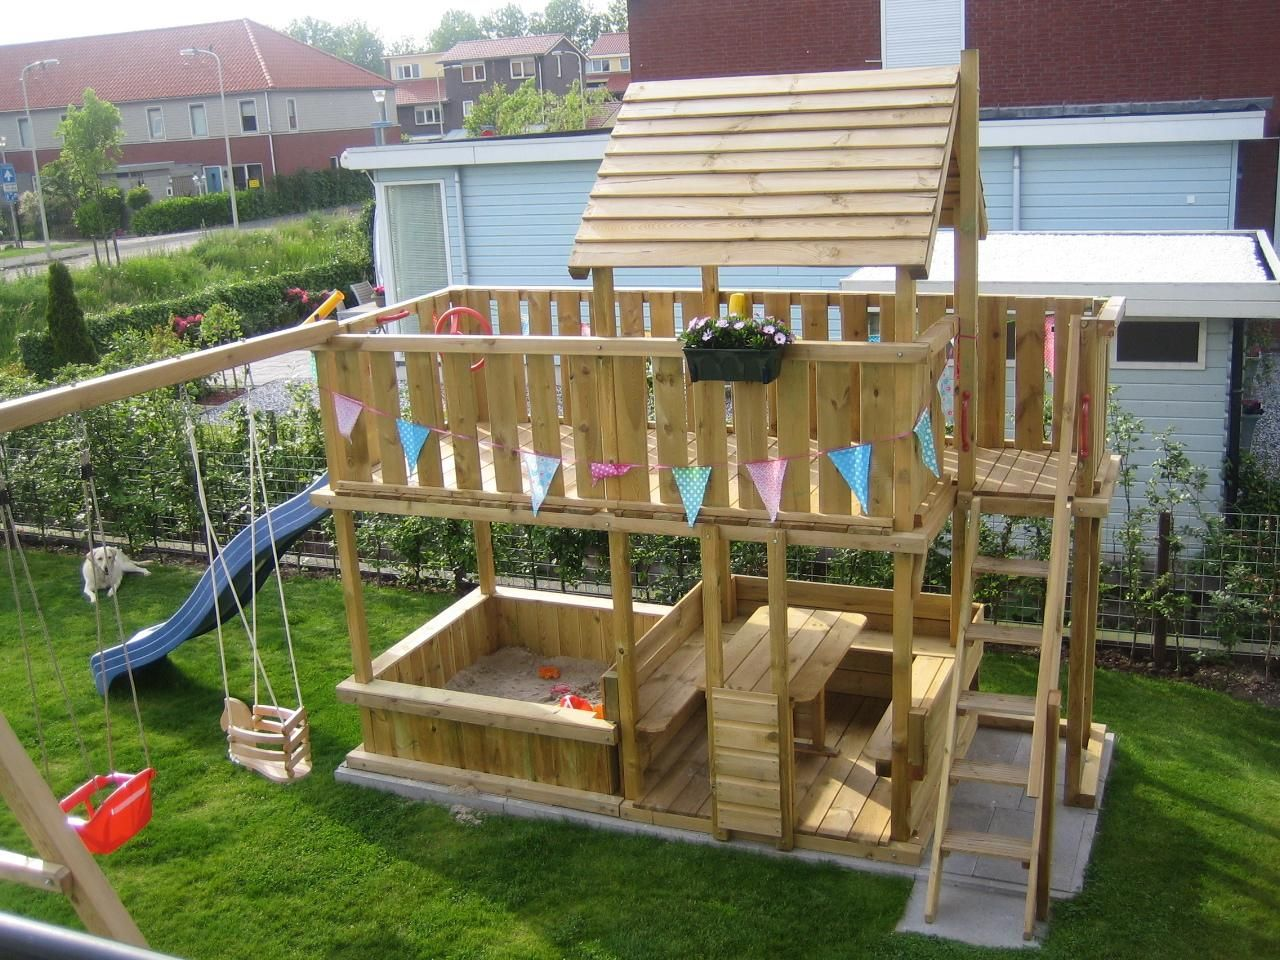 Speeltoestel Kleine Tuin : Speeltoestel balkon met rondzit en dubbele schommel speeltoestel